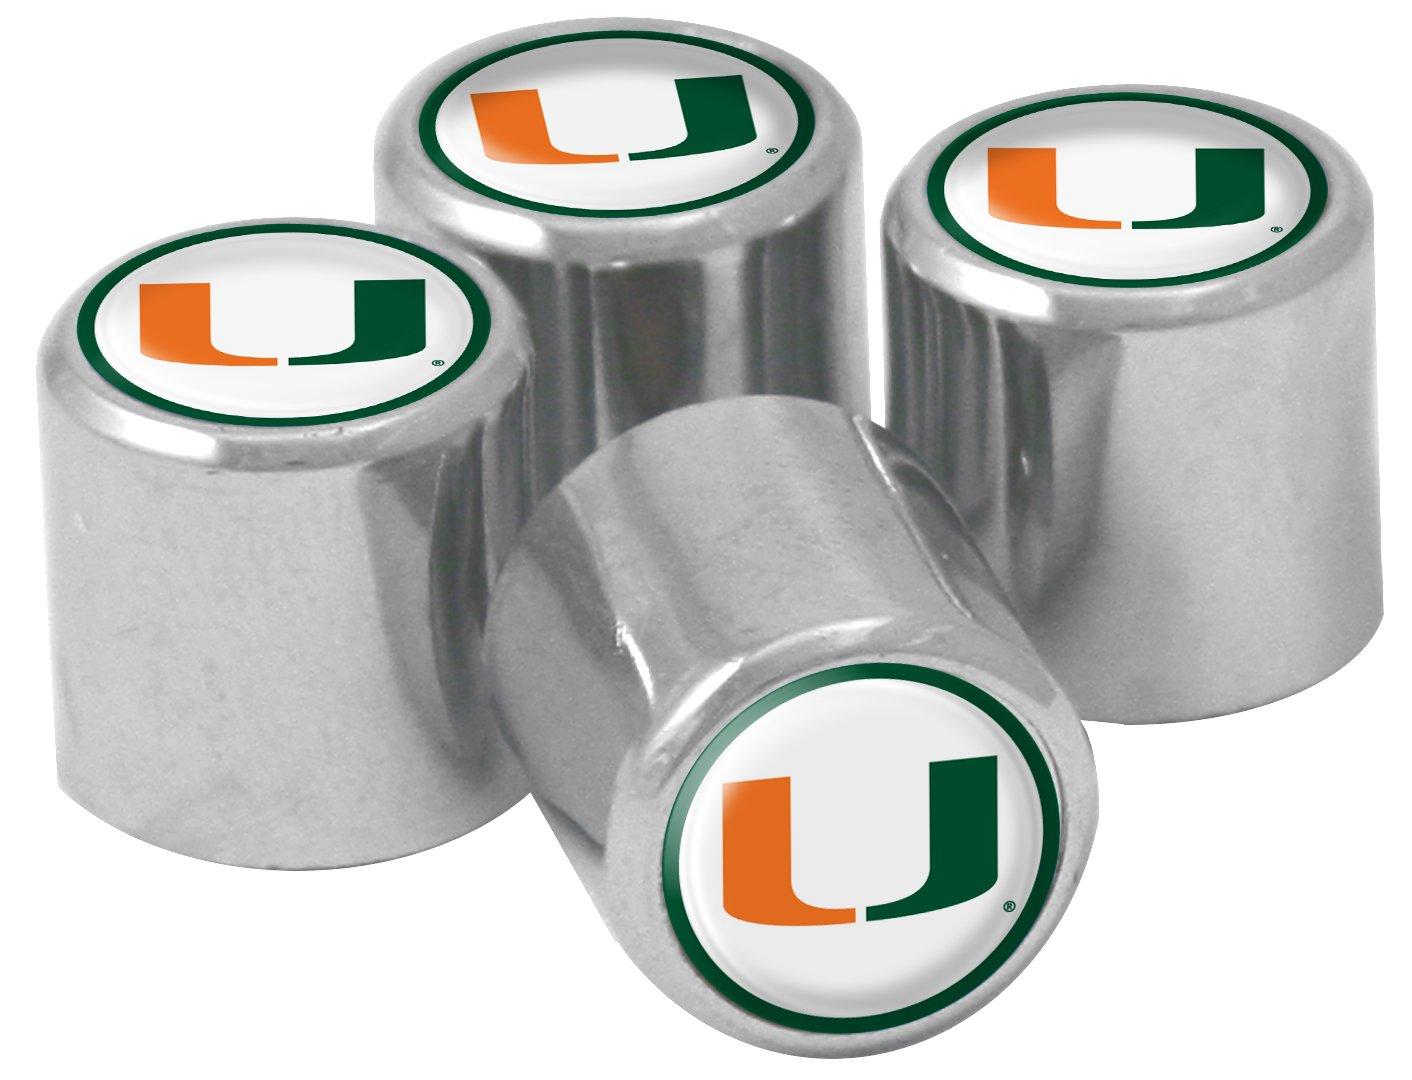 NCAA Miami Hurricanes Metal Tire Valve Stem Caps, 4-Pack by Stockdale (Image #1)